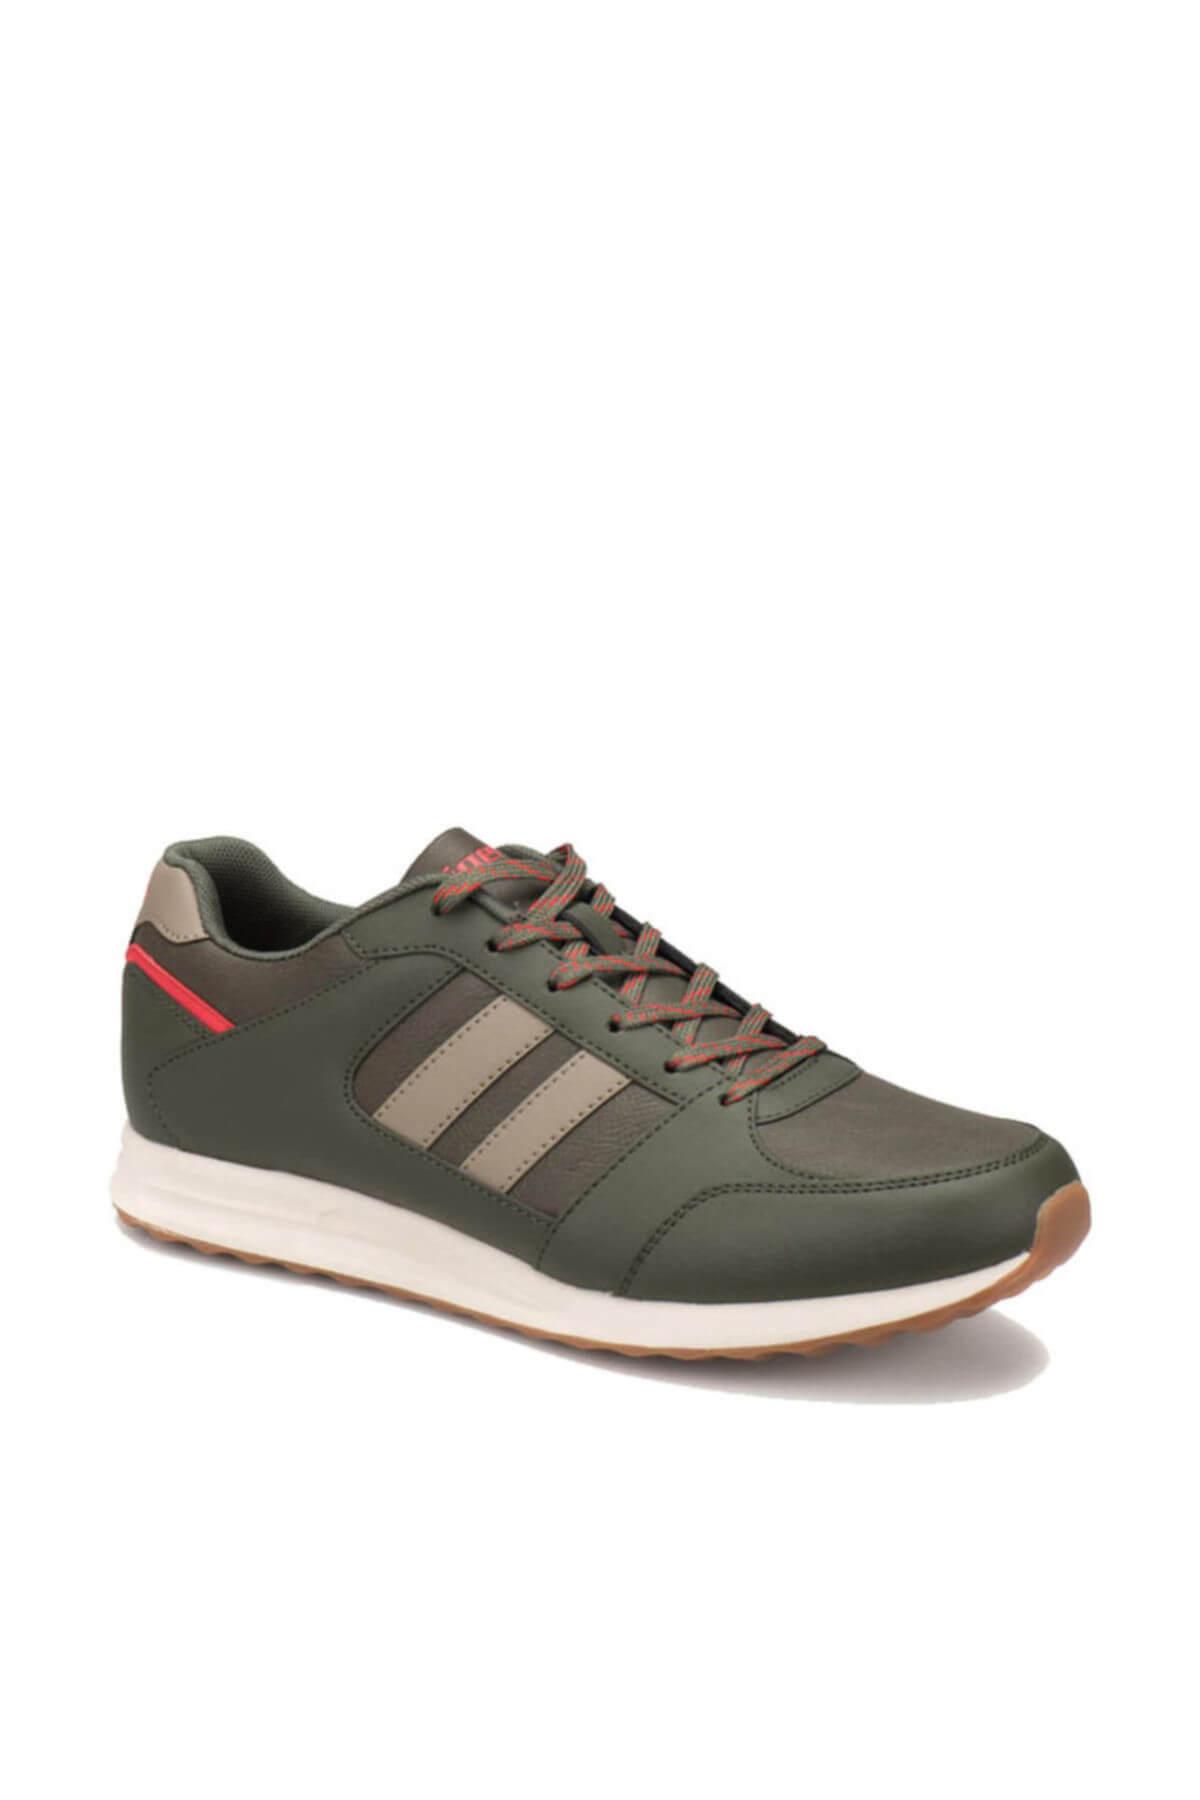 Kinetix REN M Haki Erkek Sneaker 100265367 1